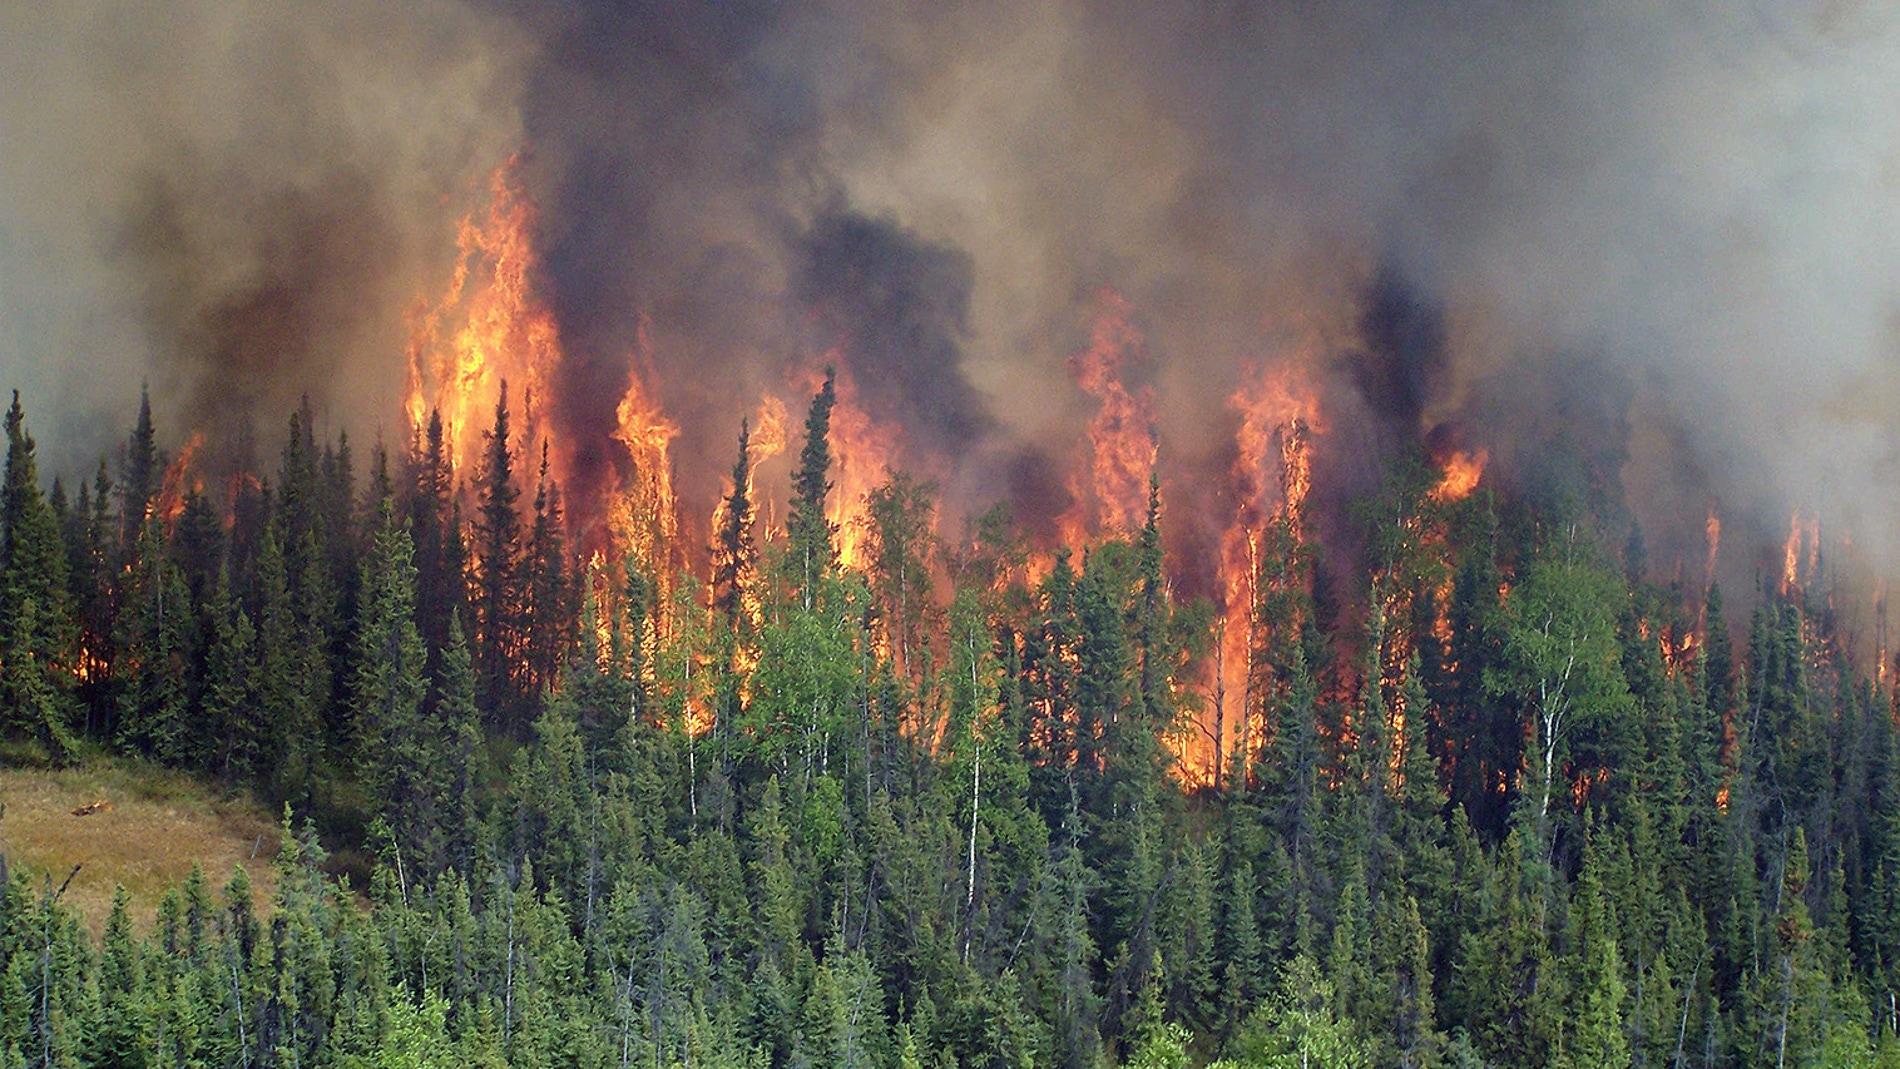 Incendio forestal en un bosque boreal de Alaska